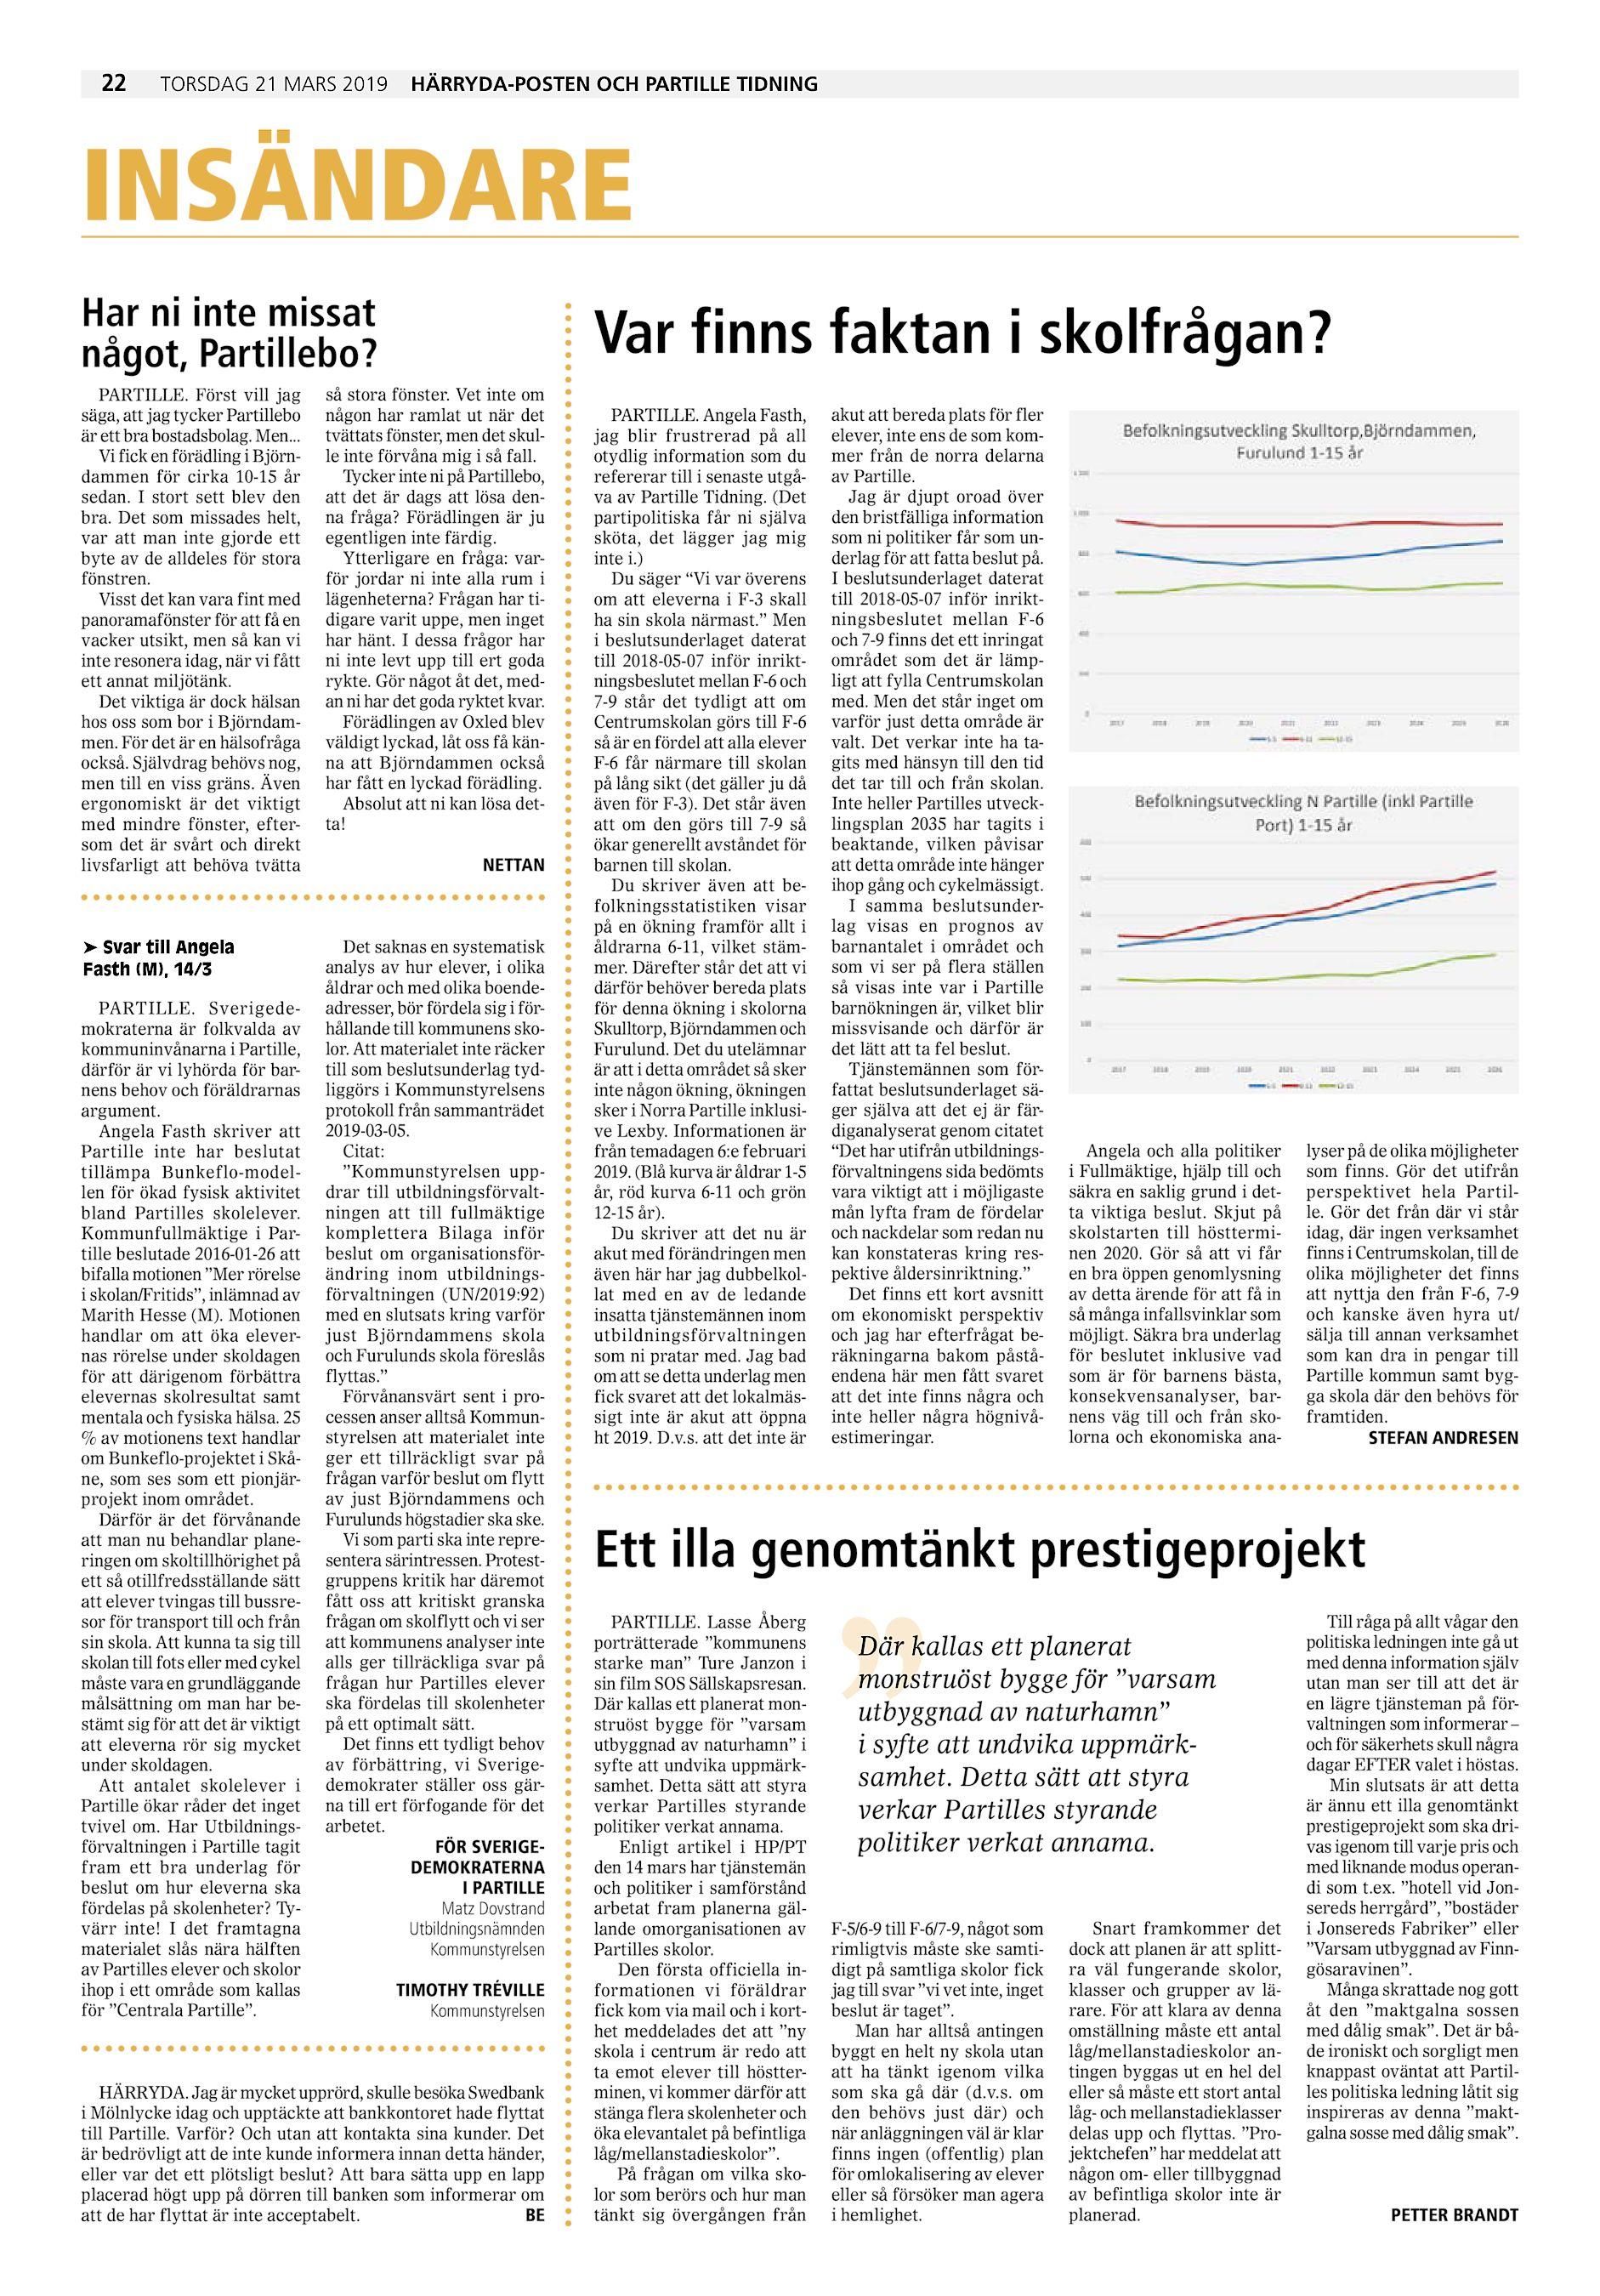 77aaefeb3eb Härrydaposten / Partille Tidning PT-2019-03-21 (endast text)